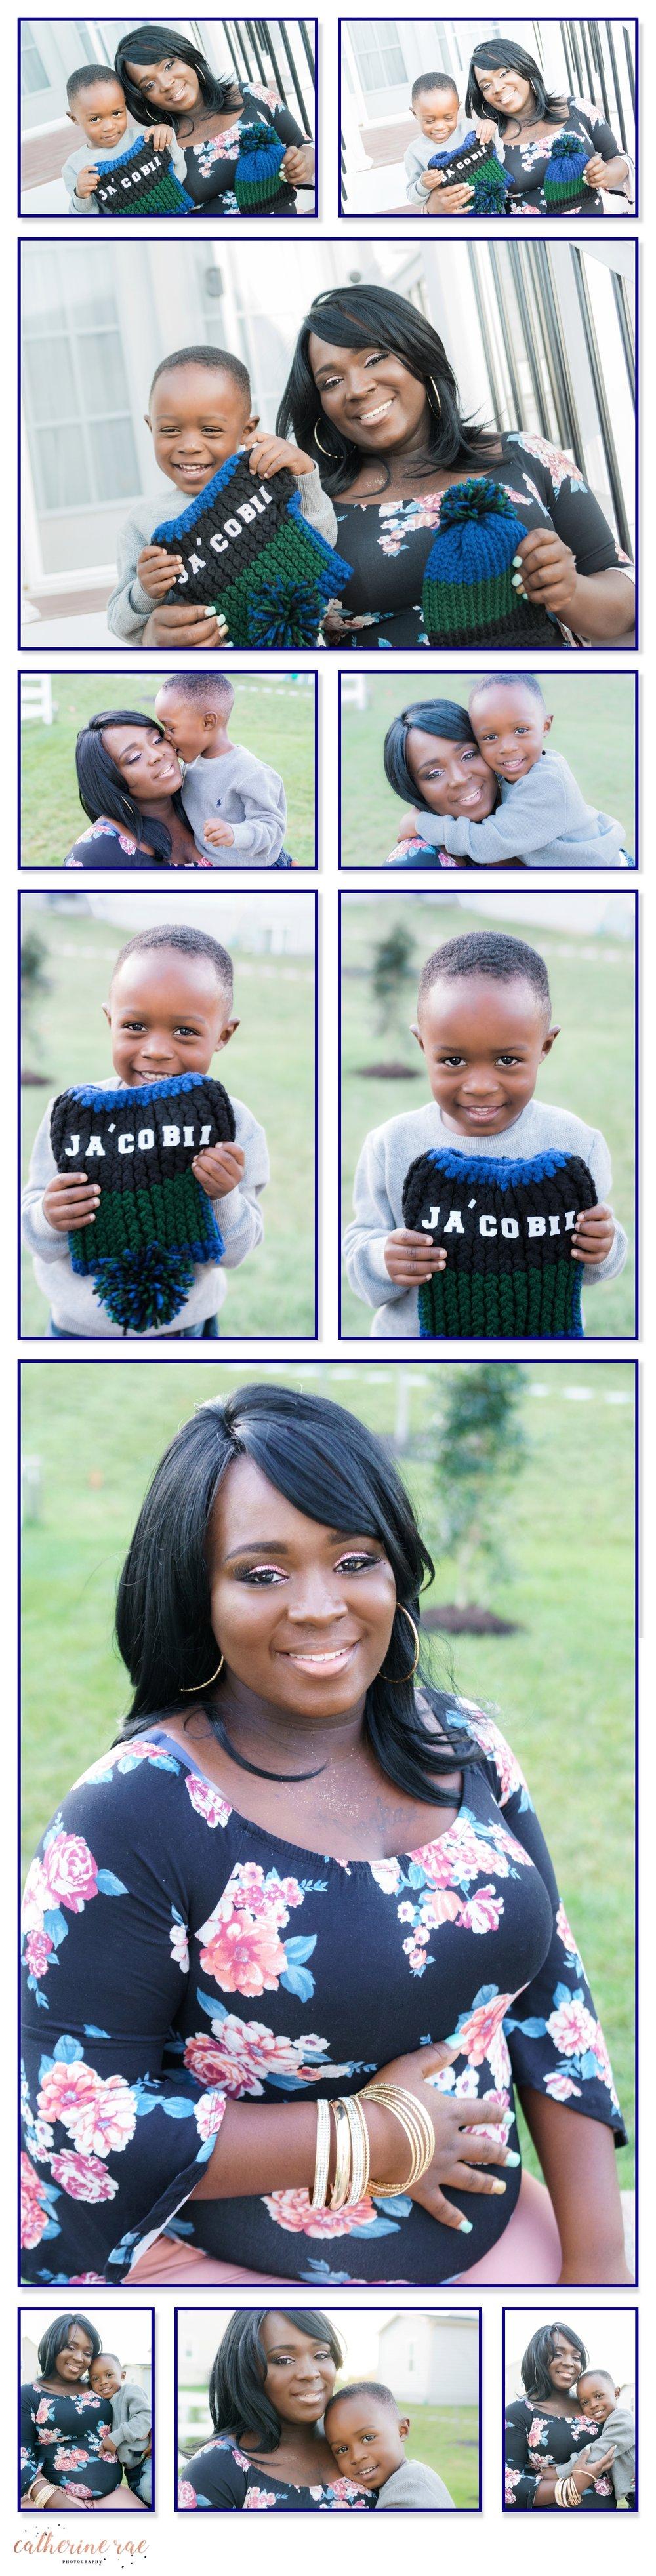 Jamika_Maternity_Portraits 1.jpg